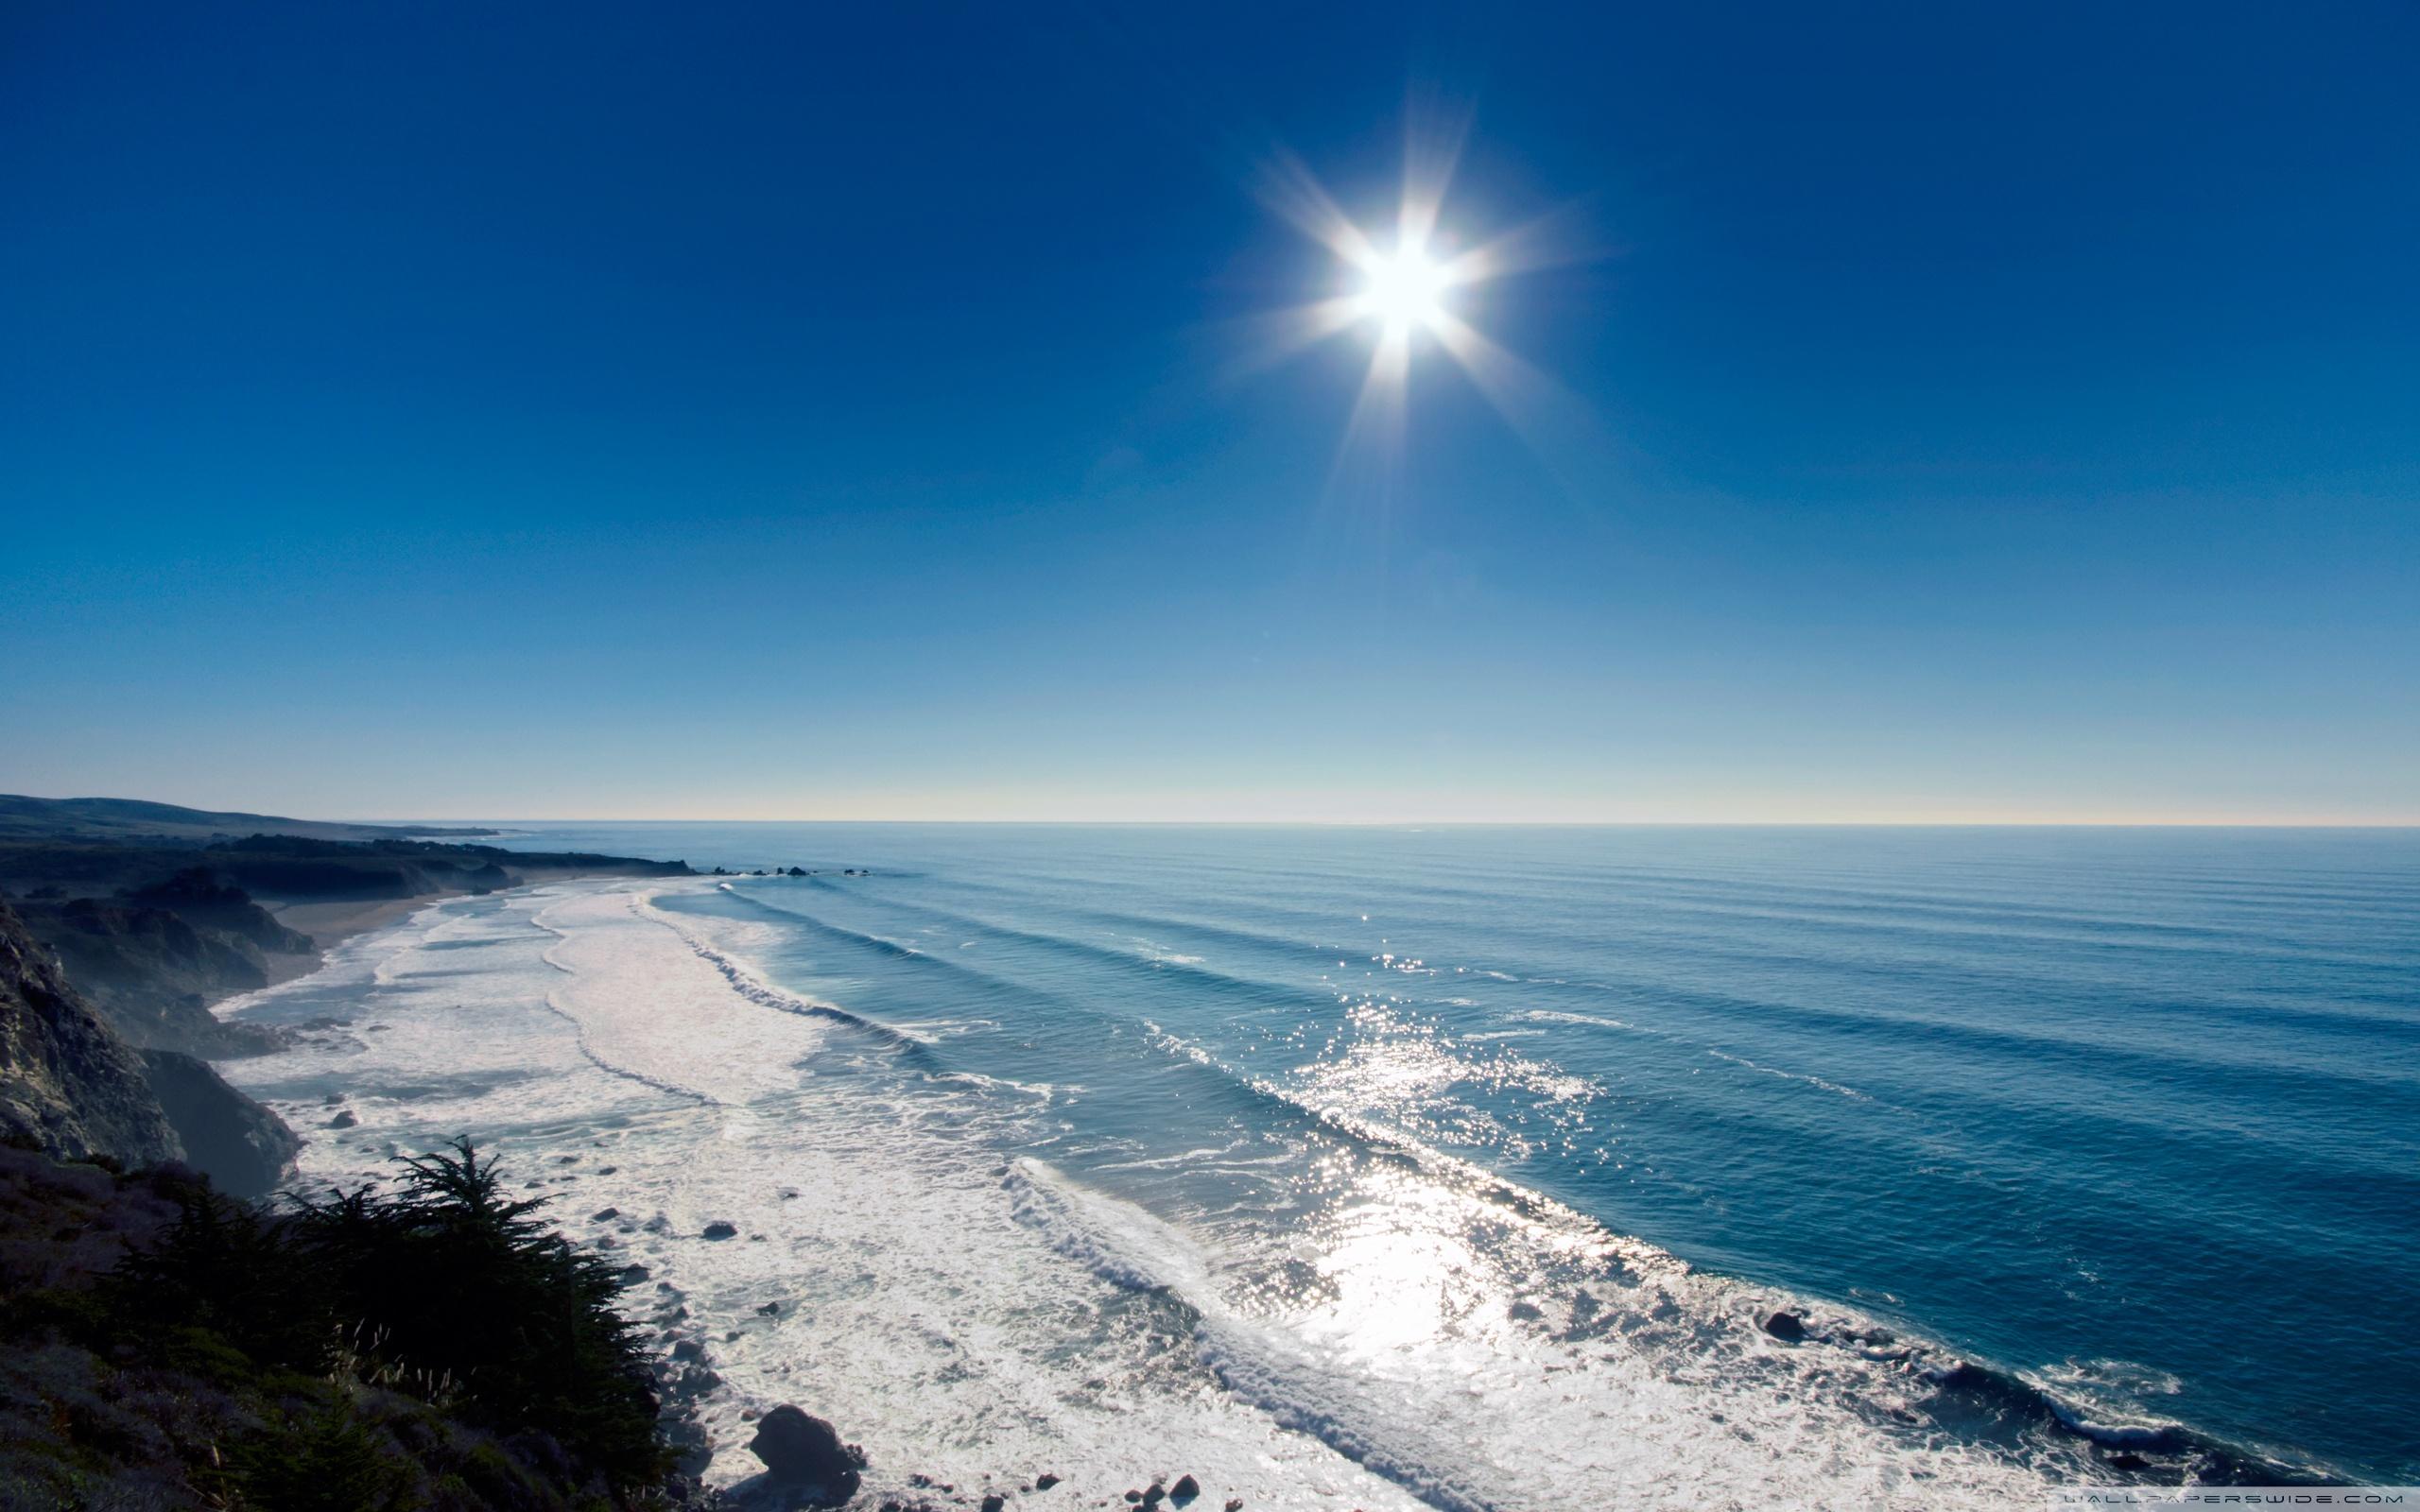 Sunshine HD desktop wallpaper : High Definition : Fullscreen : Mobile